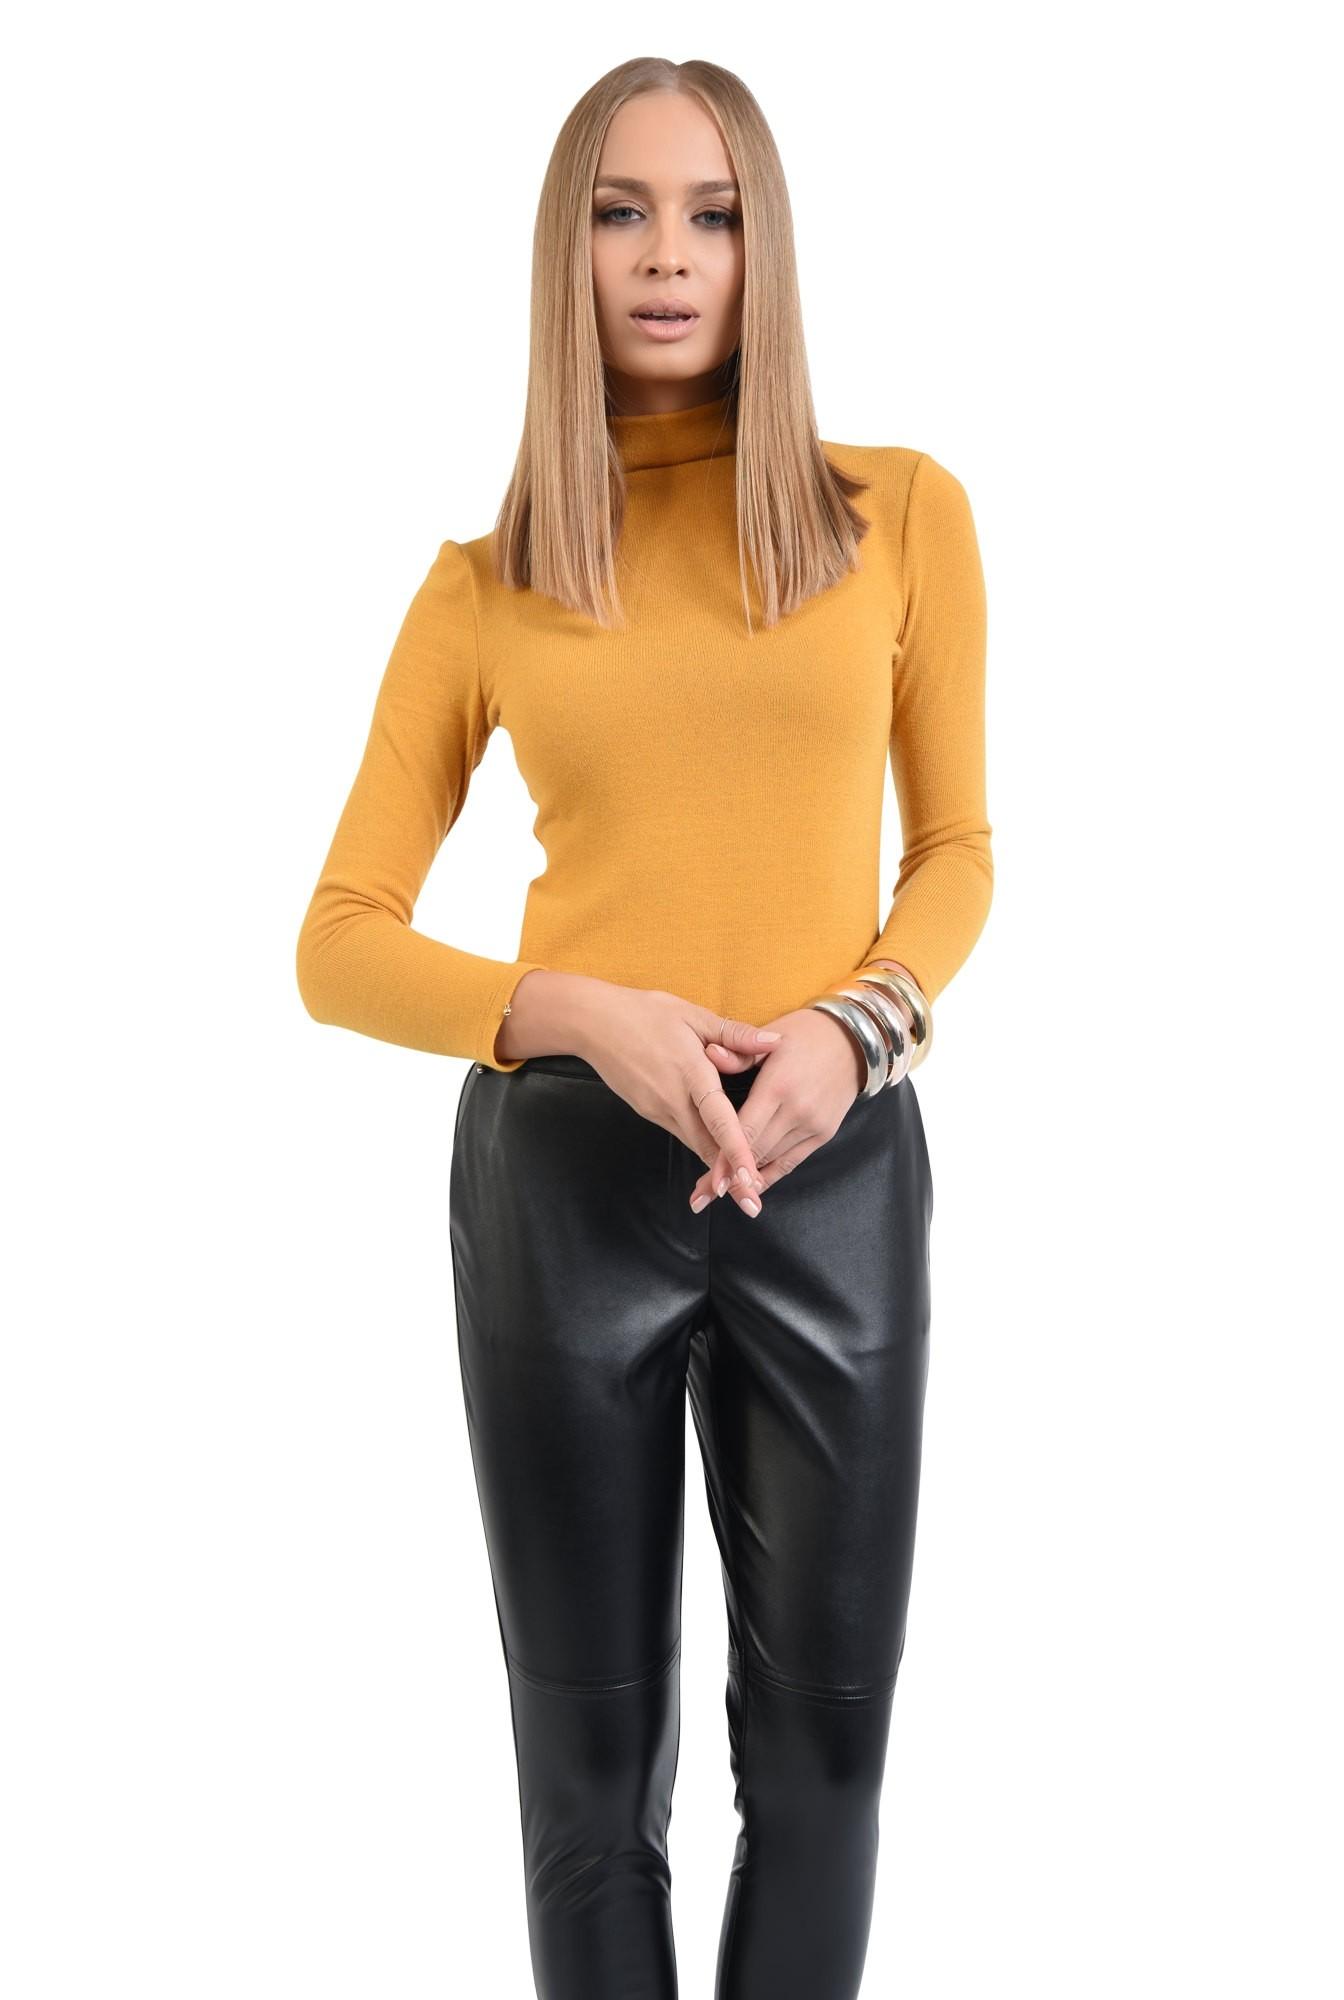 0 - pantaloni casual, cusatura decorativa, buzunare functionale, negri, PU